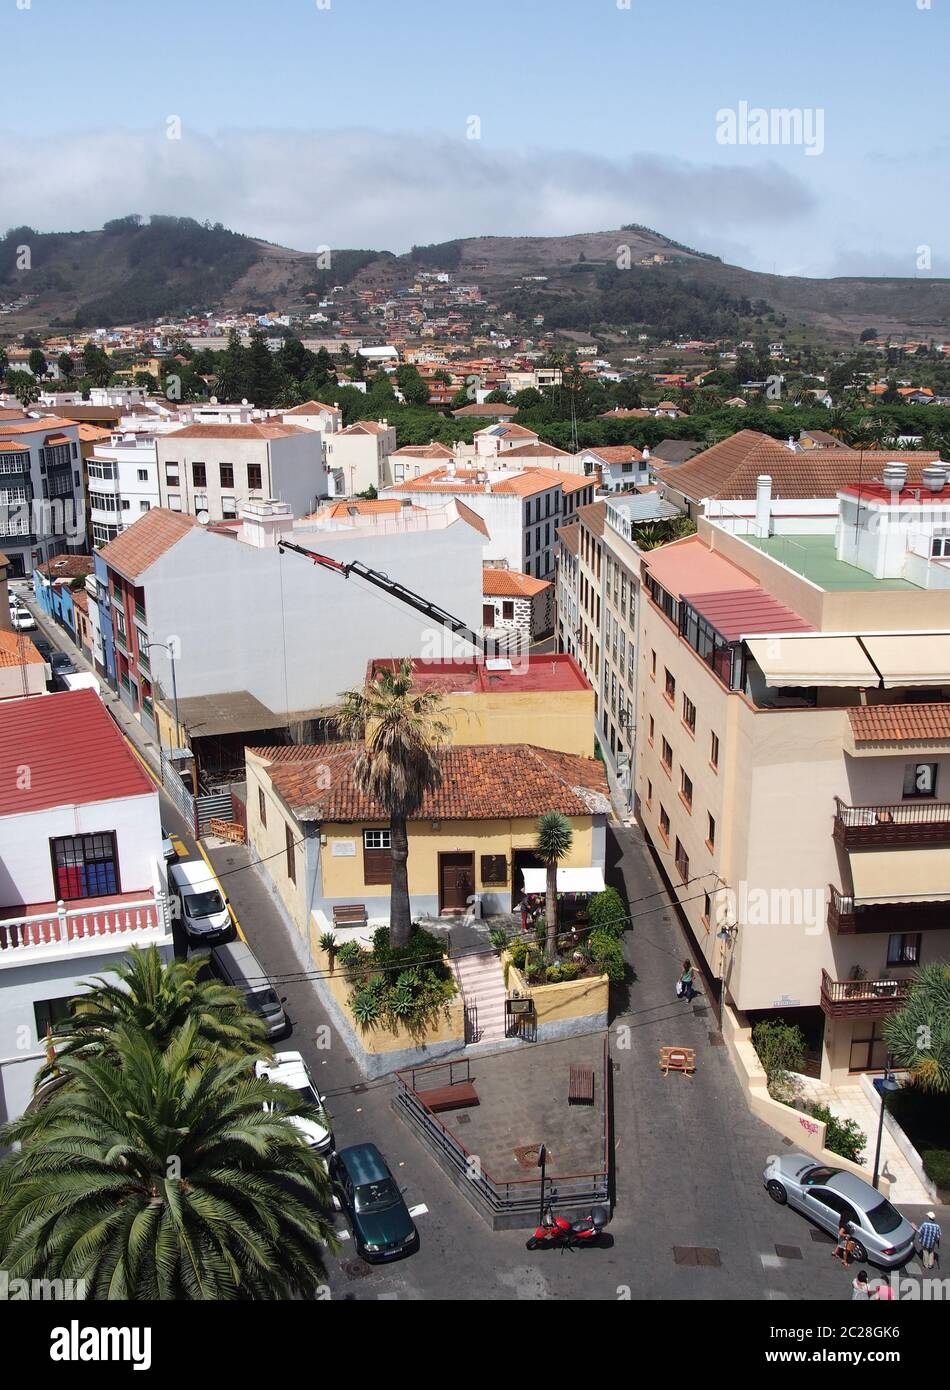 cityscape view of La Laguna in Tenerife panoramic view Stock Photo